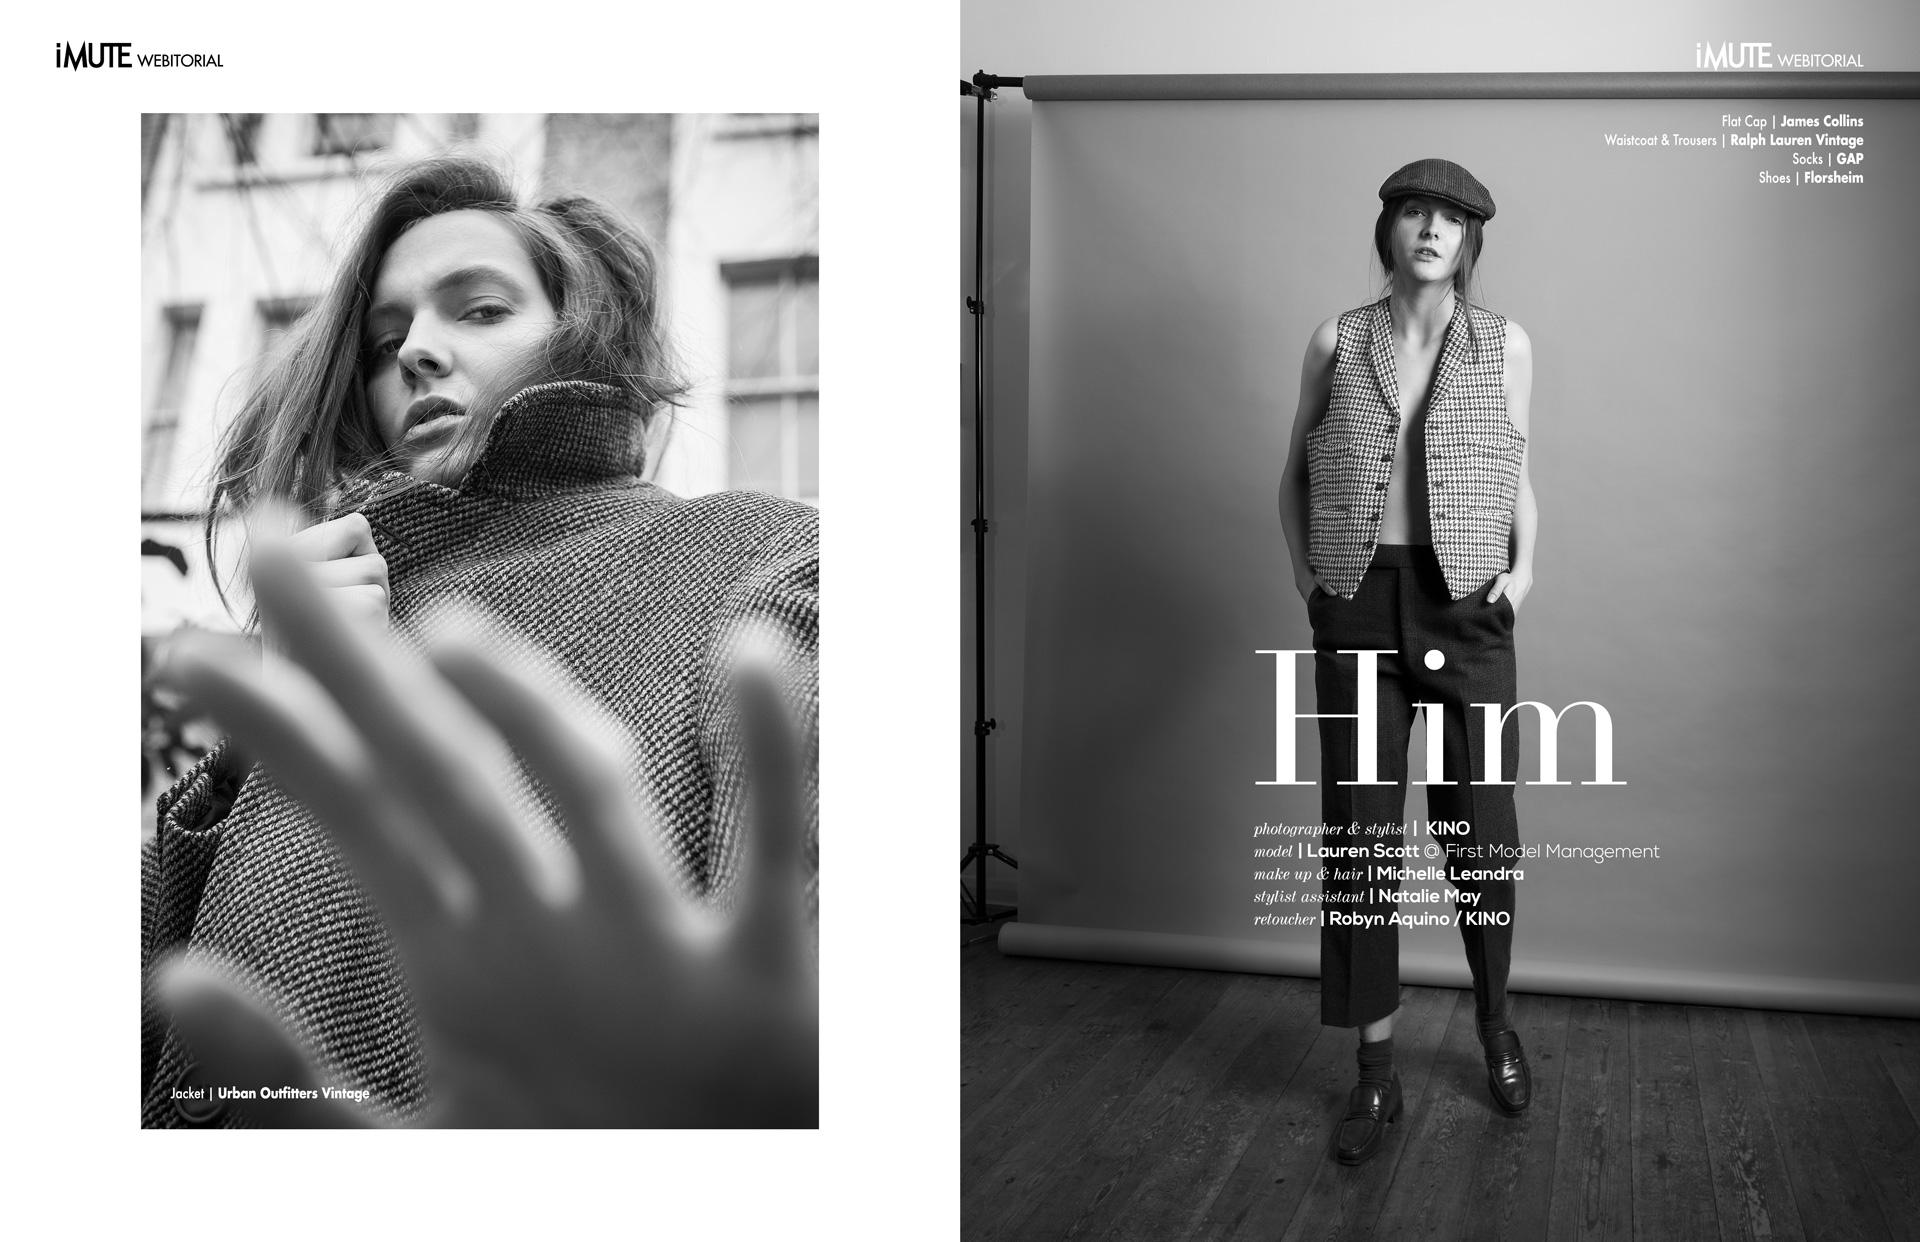 HIM webitorial for iMute Magazine Photographer & Stylist|KINO Model| Lauren Scott @First Model Management Makeup & Hair|Michelle Leandra Stylist Assistant|Natalie May Retoucher|Robyn Aquino / KINO